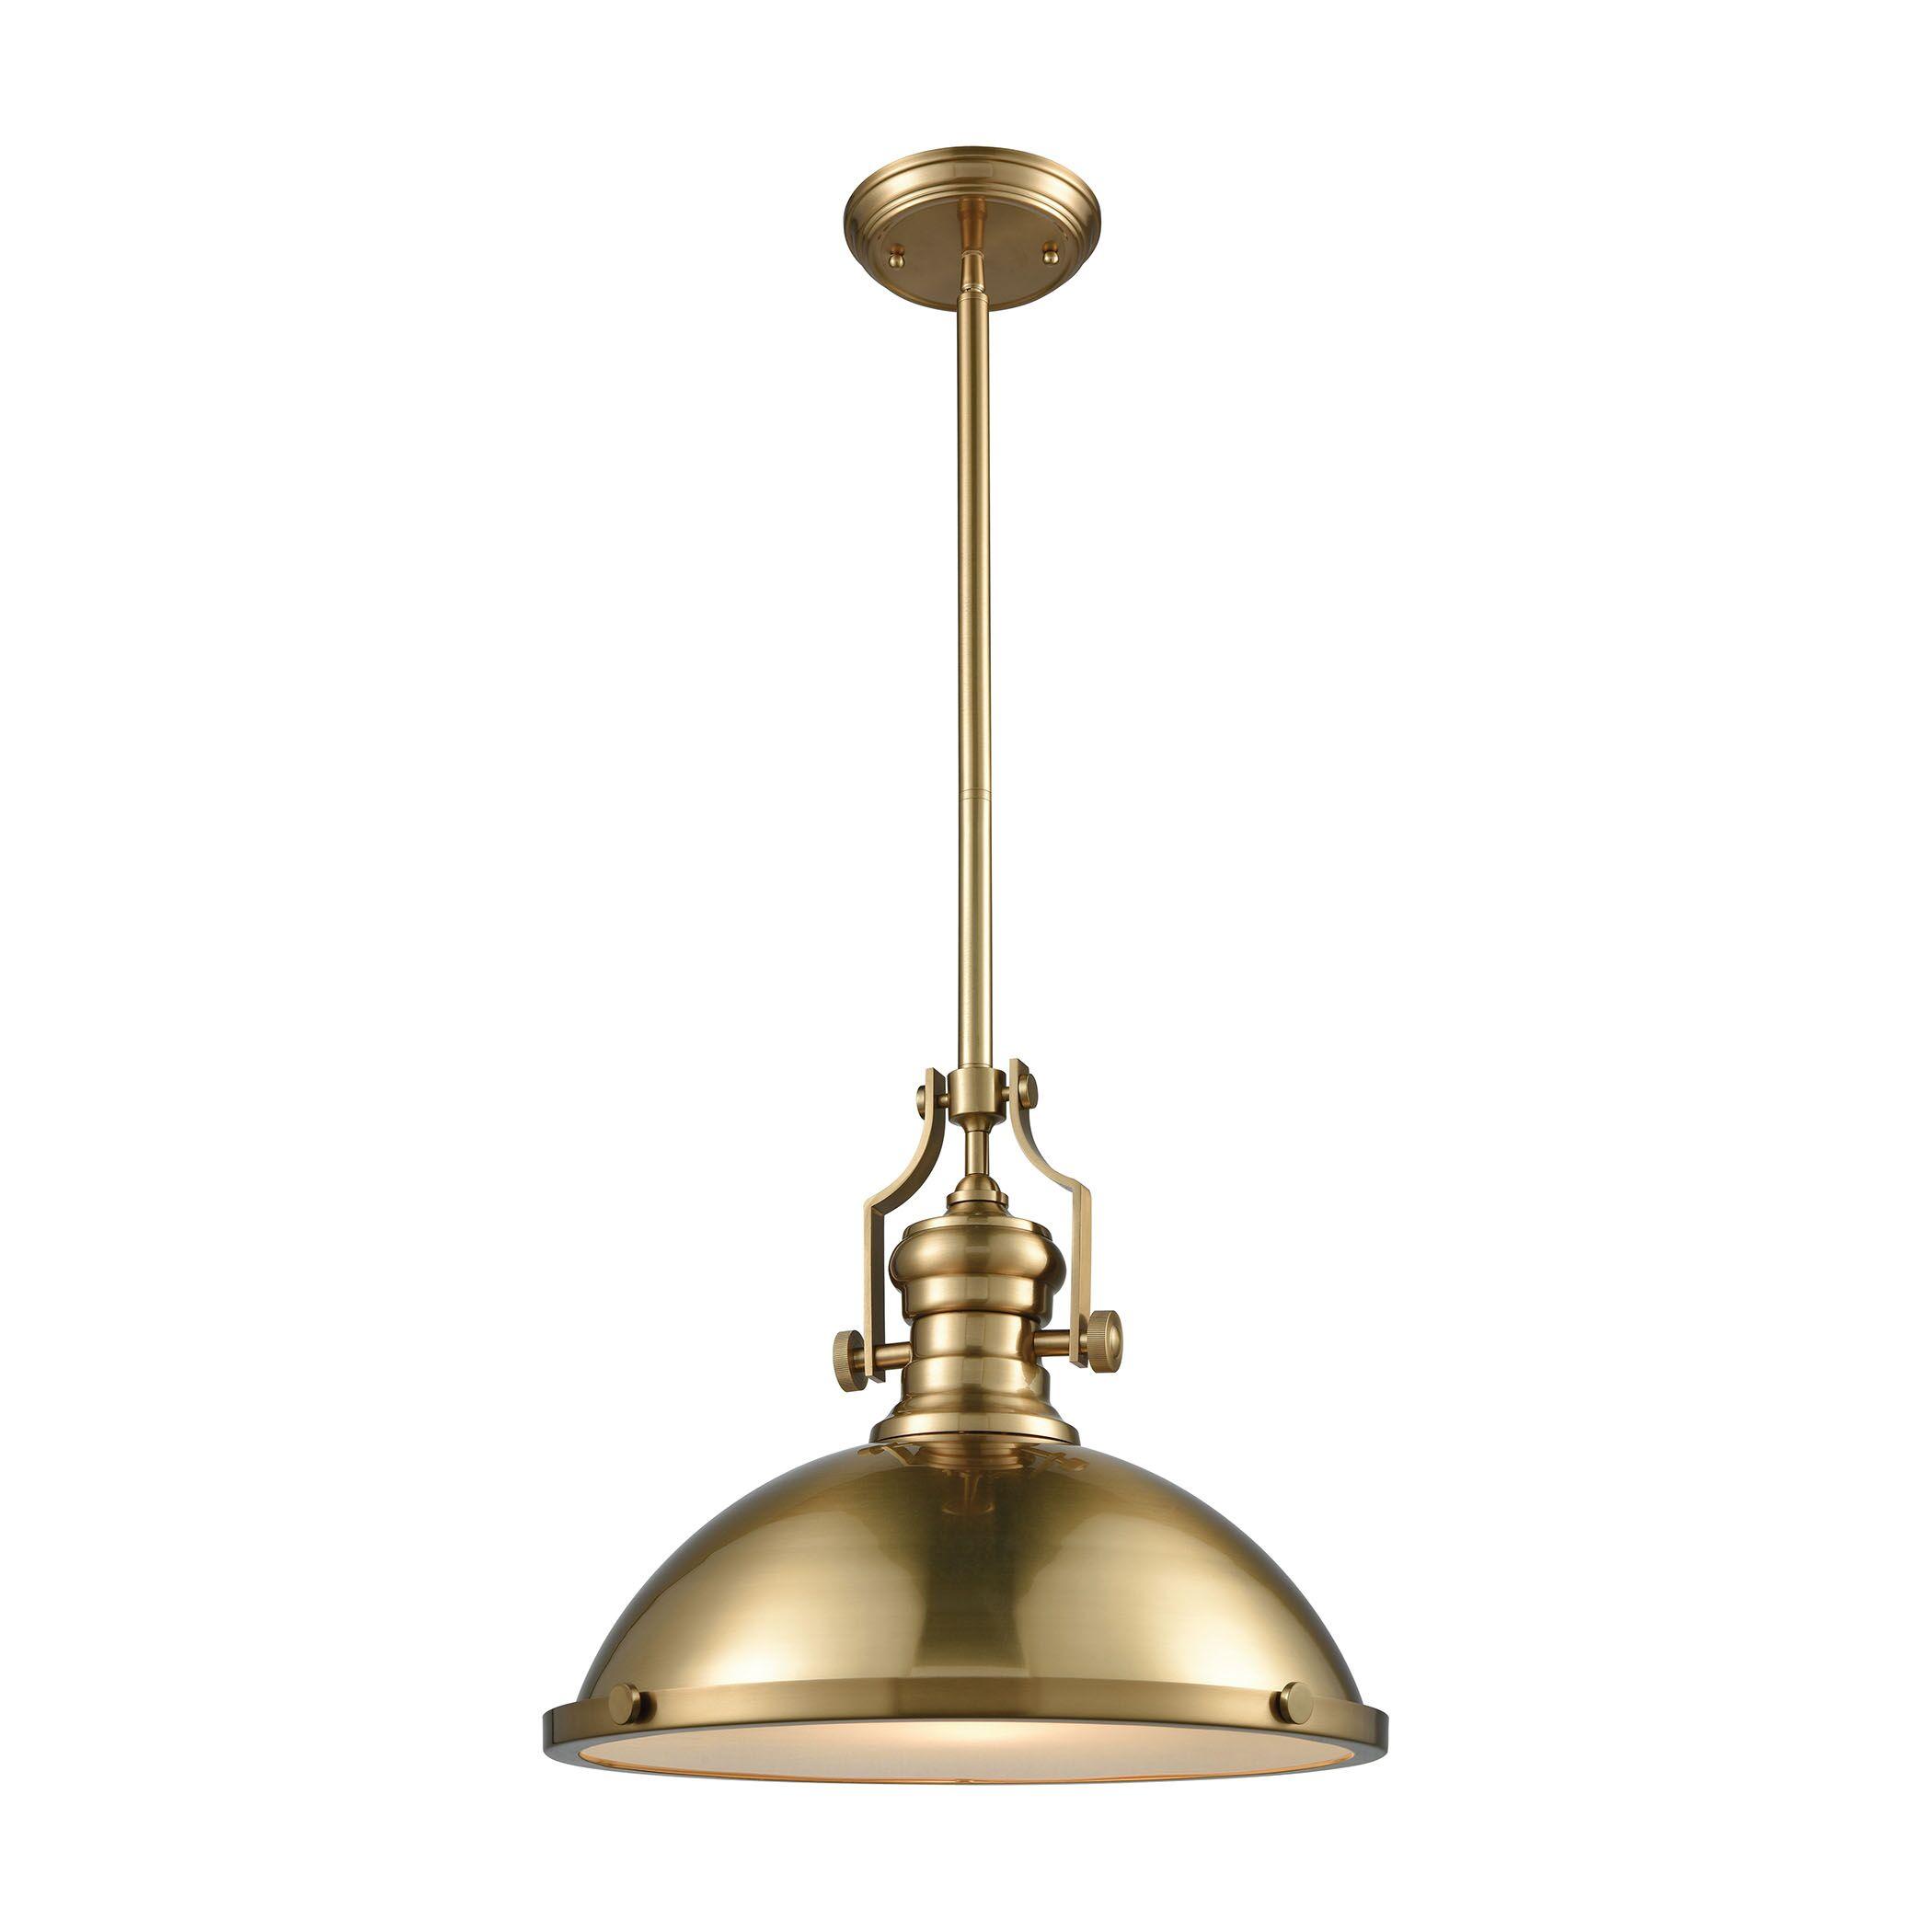 Susan 1-Light Dome Pendant Finish: Satin Brass, Size: 14